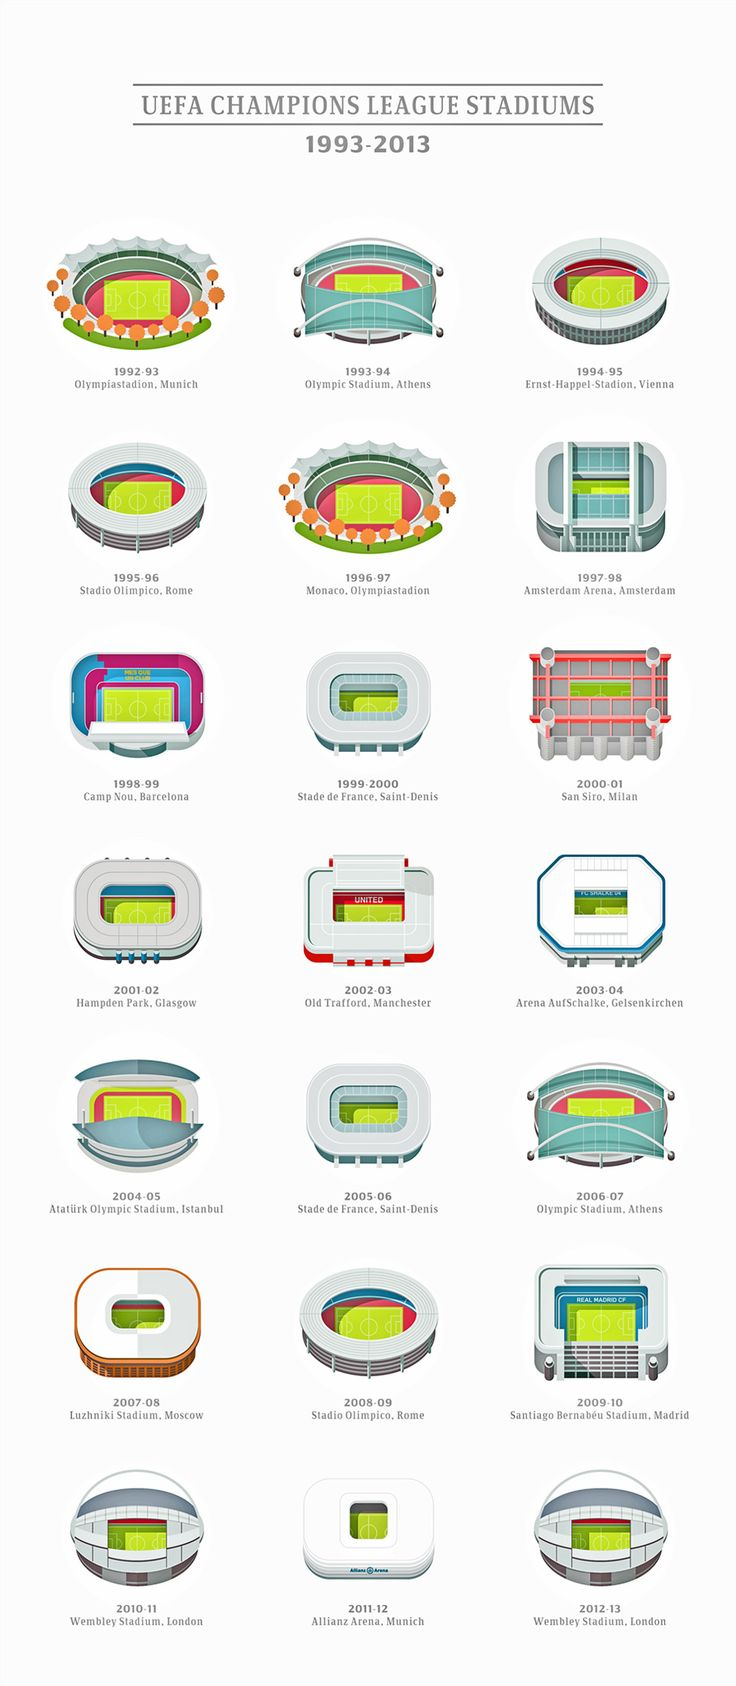 Estadios de final de Champions League #laturba